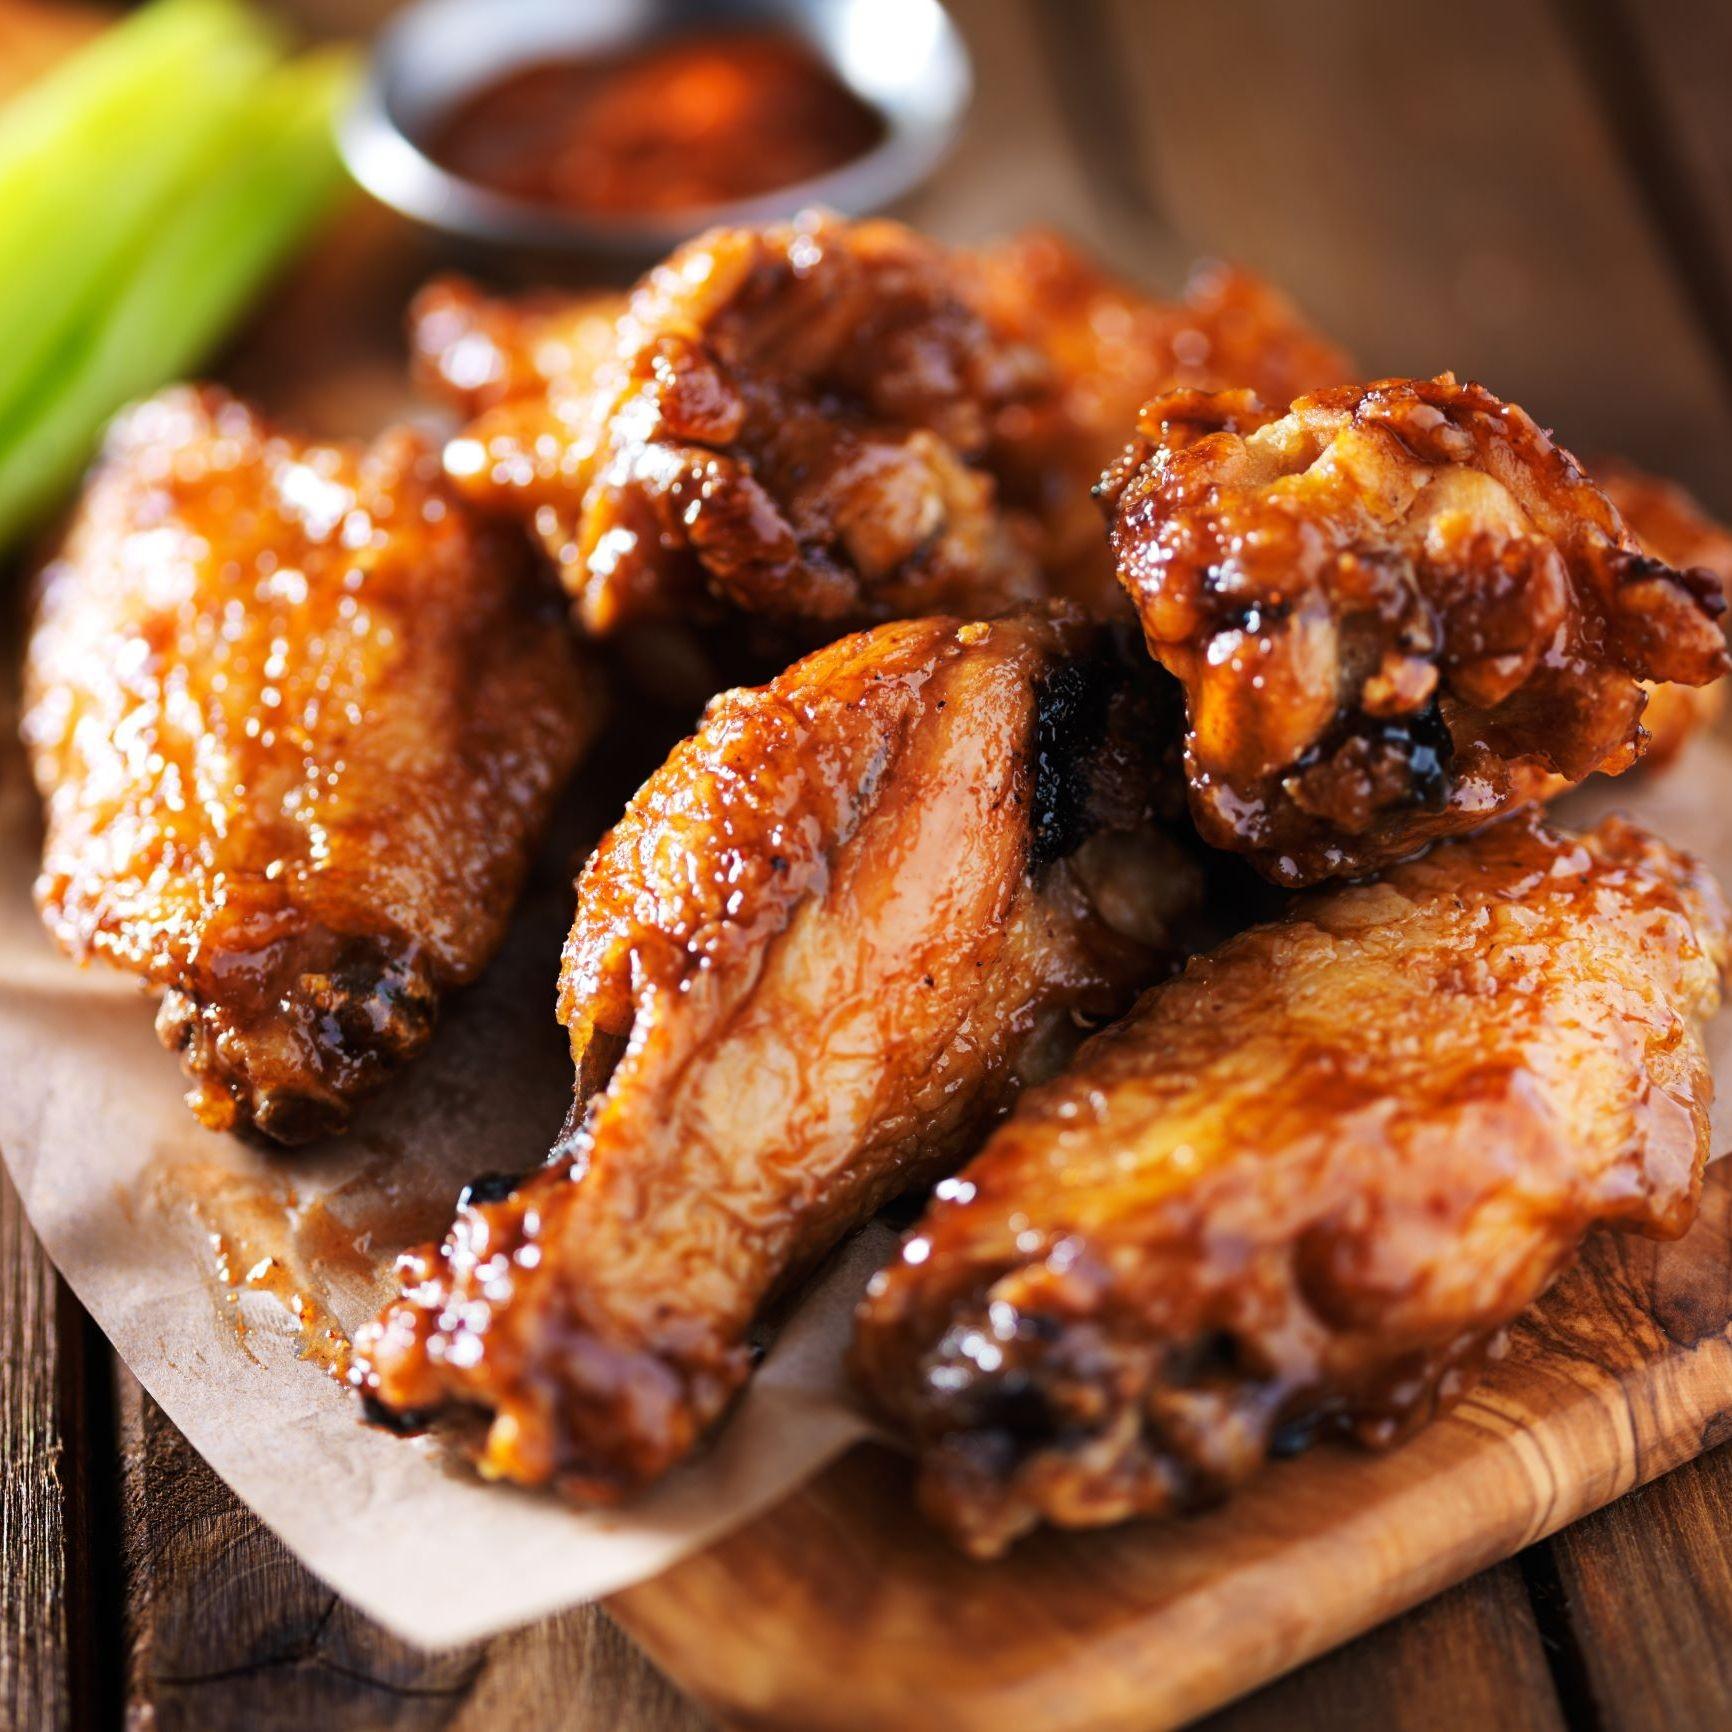 JJ Fish & Chicken Grill